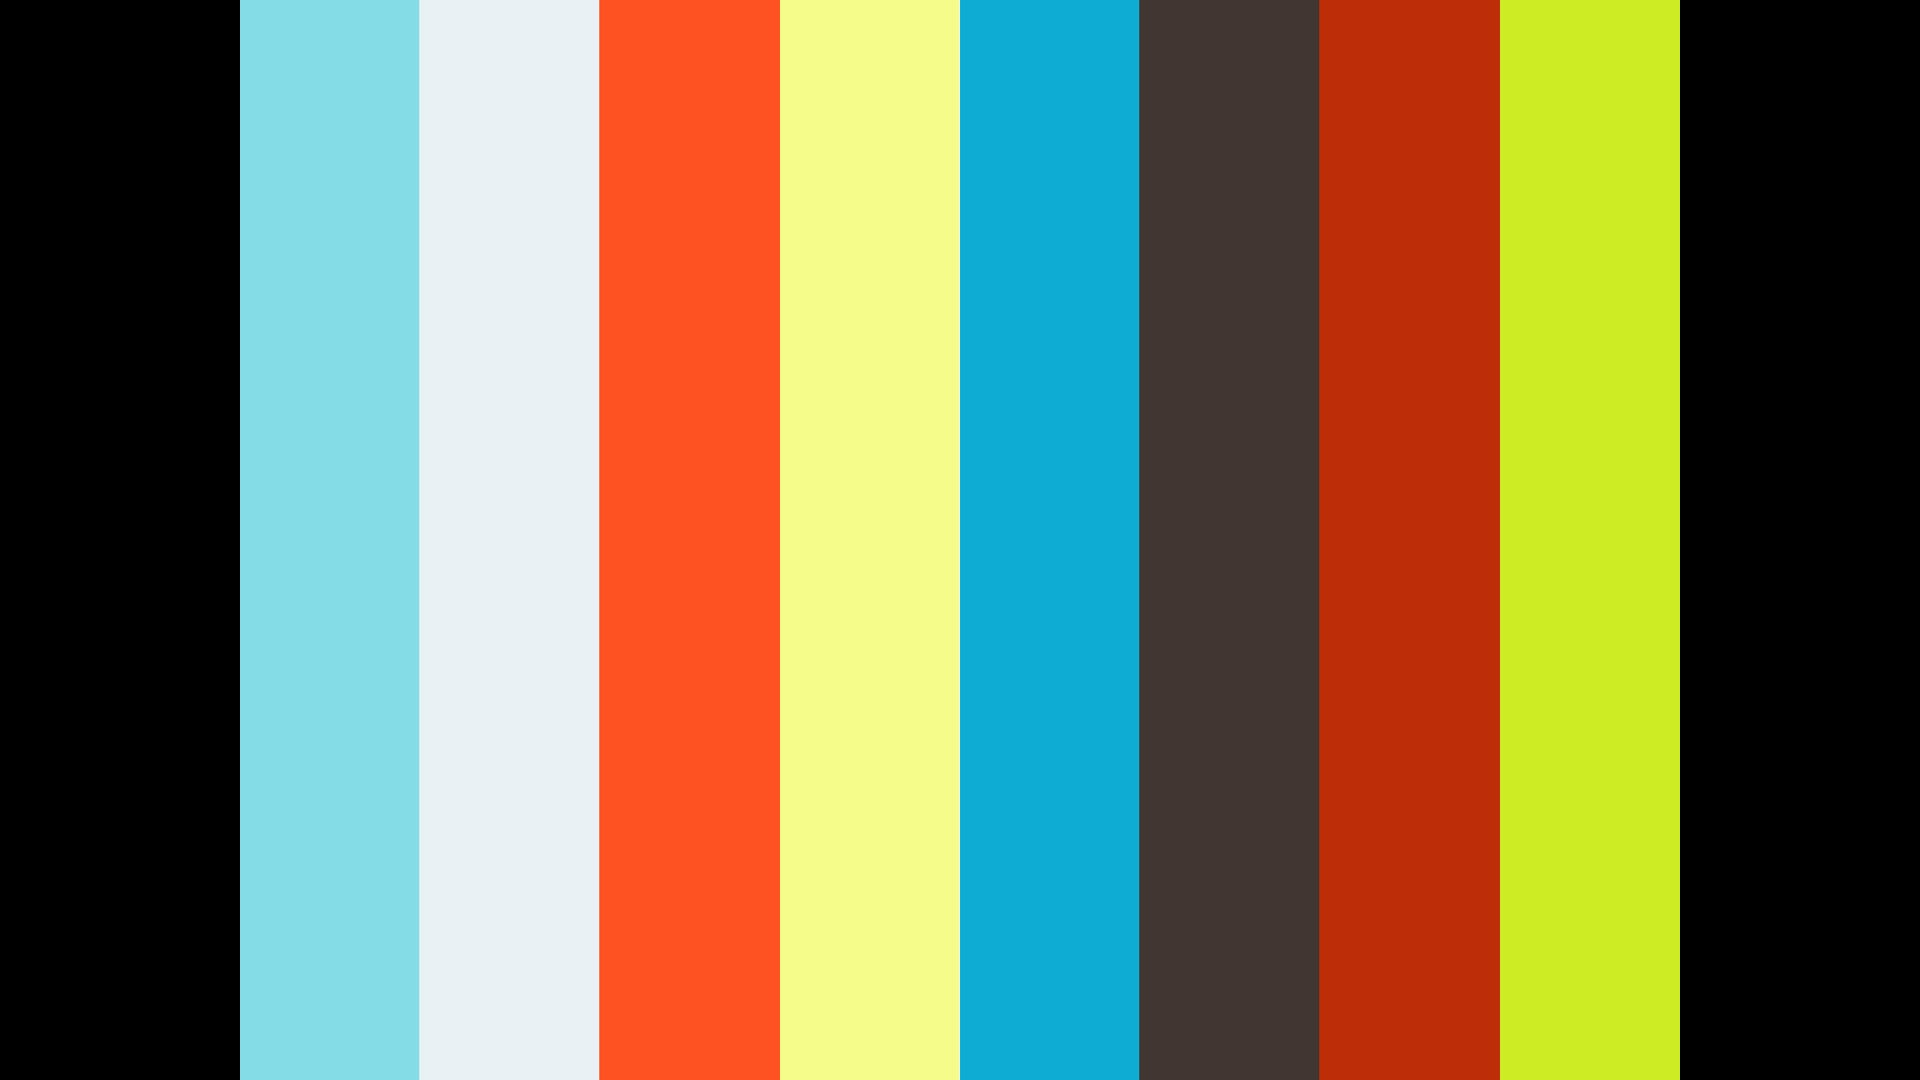 RAINBOX_HIPHOP_TURTLES